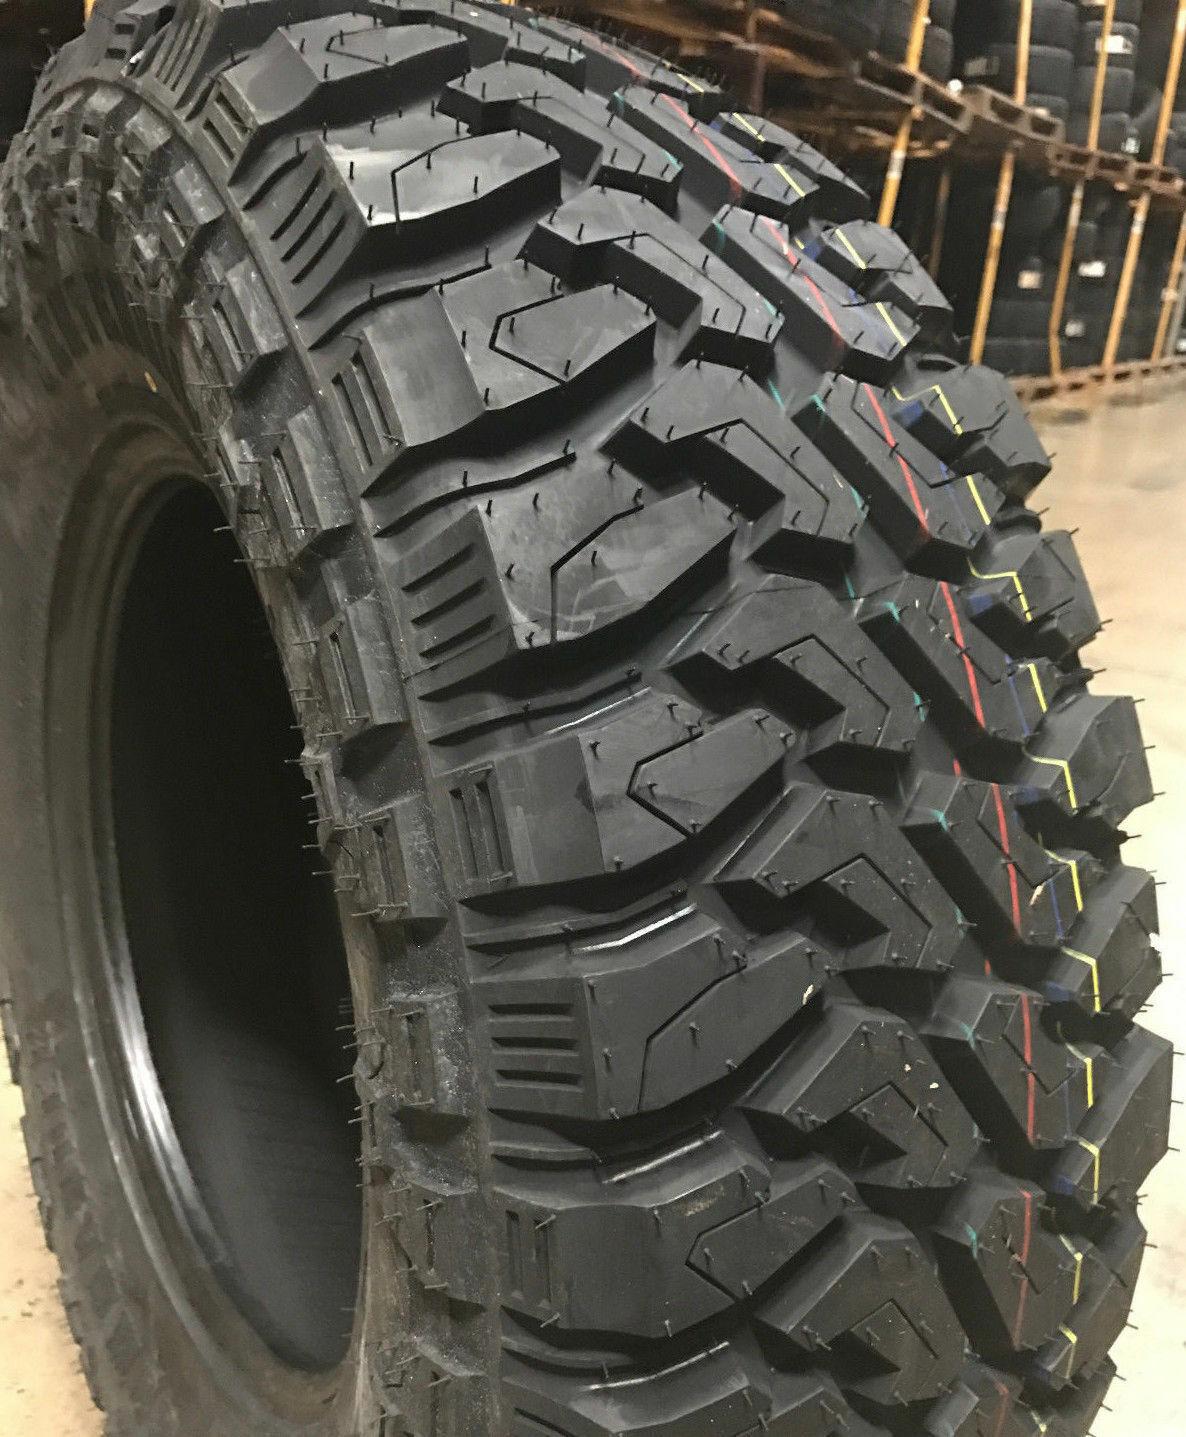 4 NEW 285/70R17 Centennial Dirt Commander M/T Mud Tires MT 285 70 17 R17 2857017